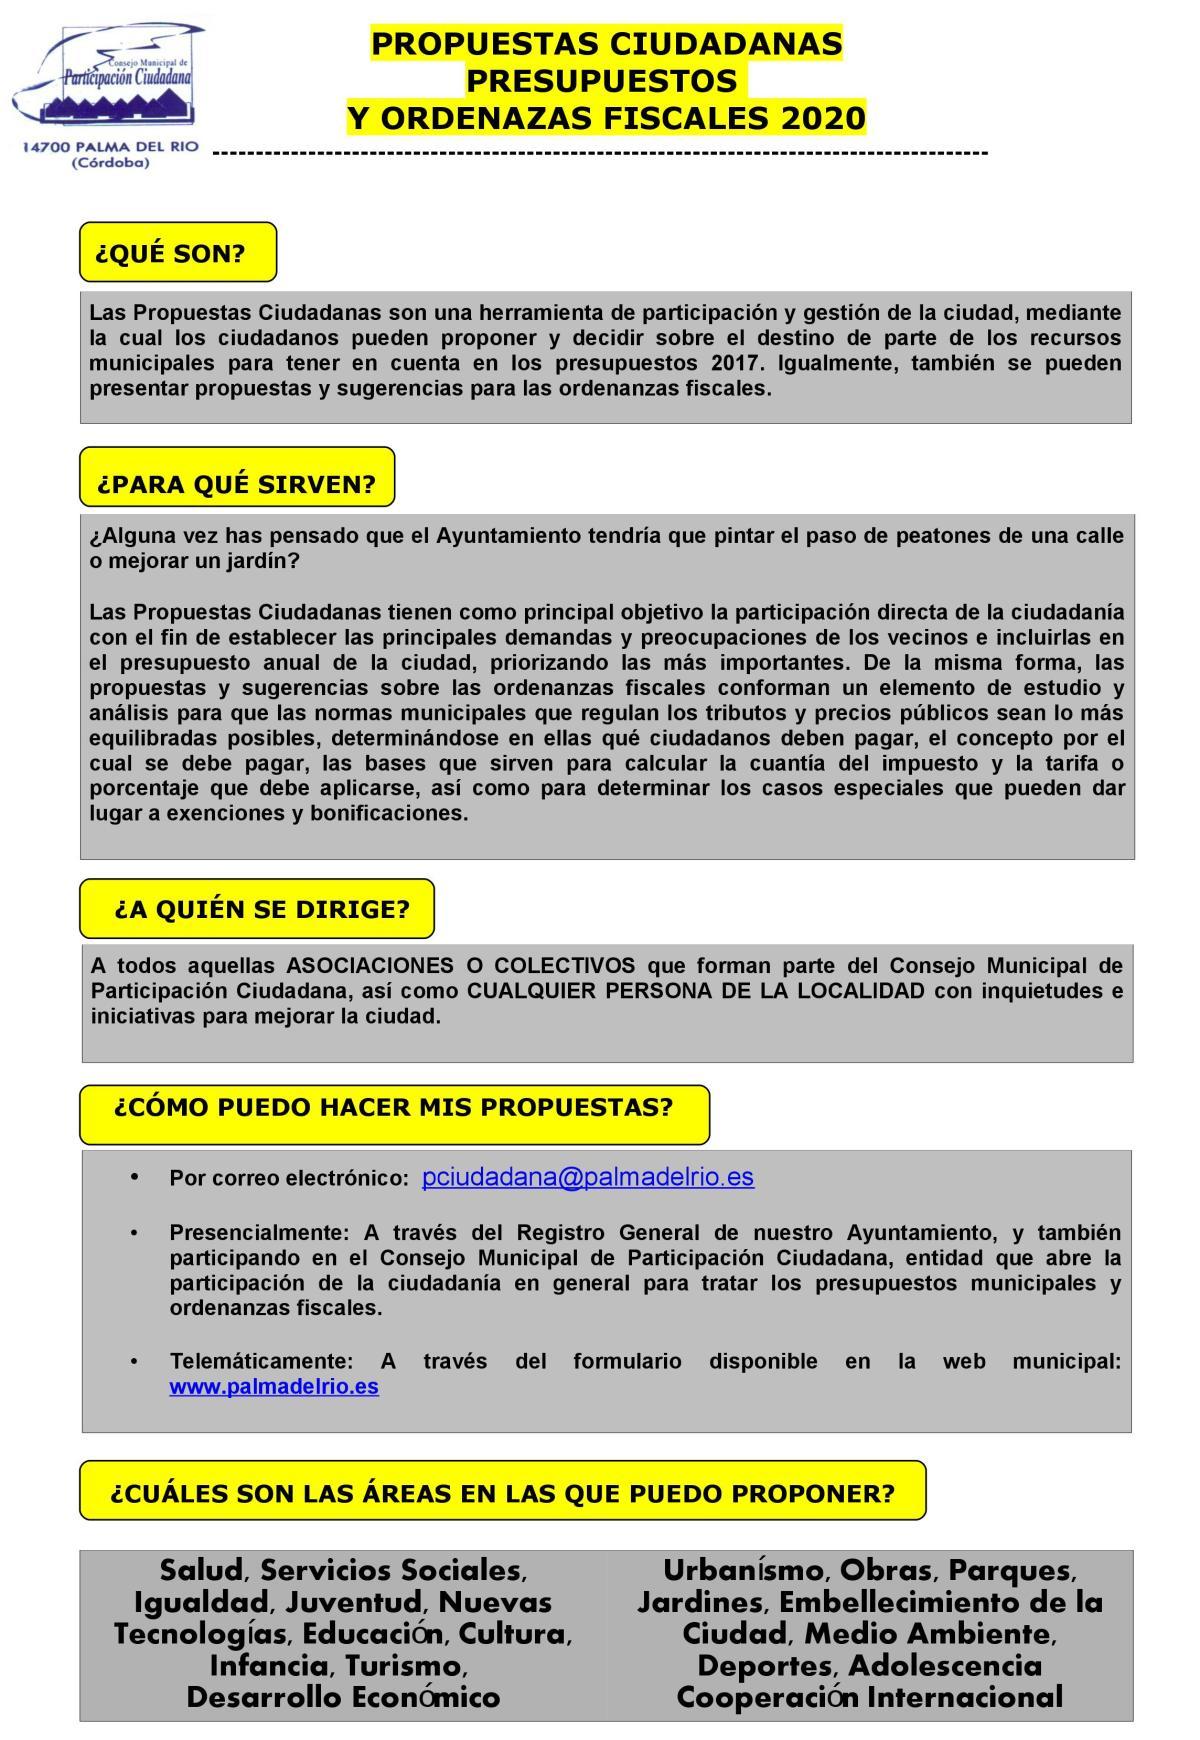 https://www.palmadelrio.es/sites/default/files/herramienta.propuestas_ciudadanas_2020.jpg